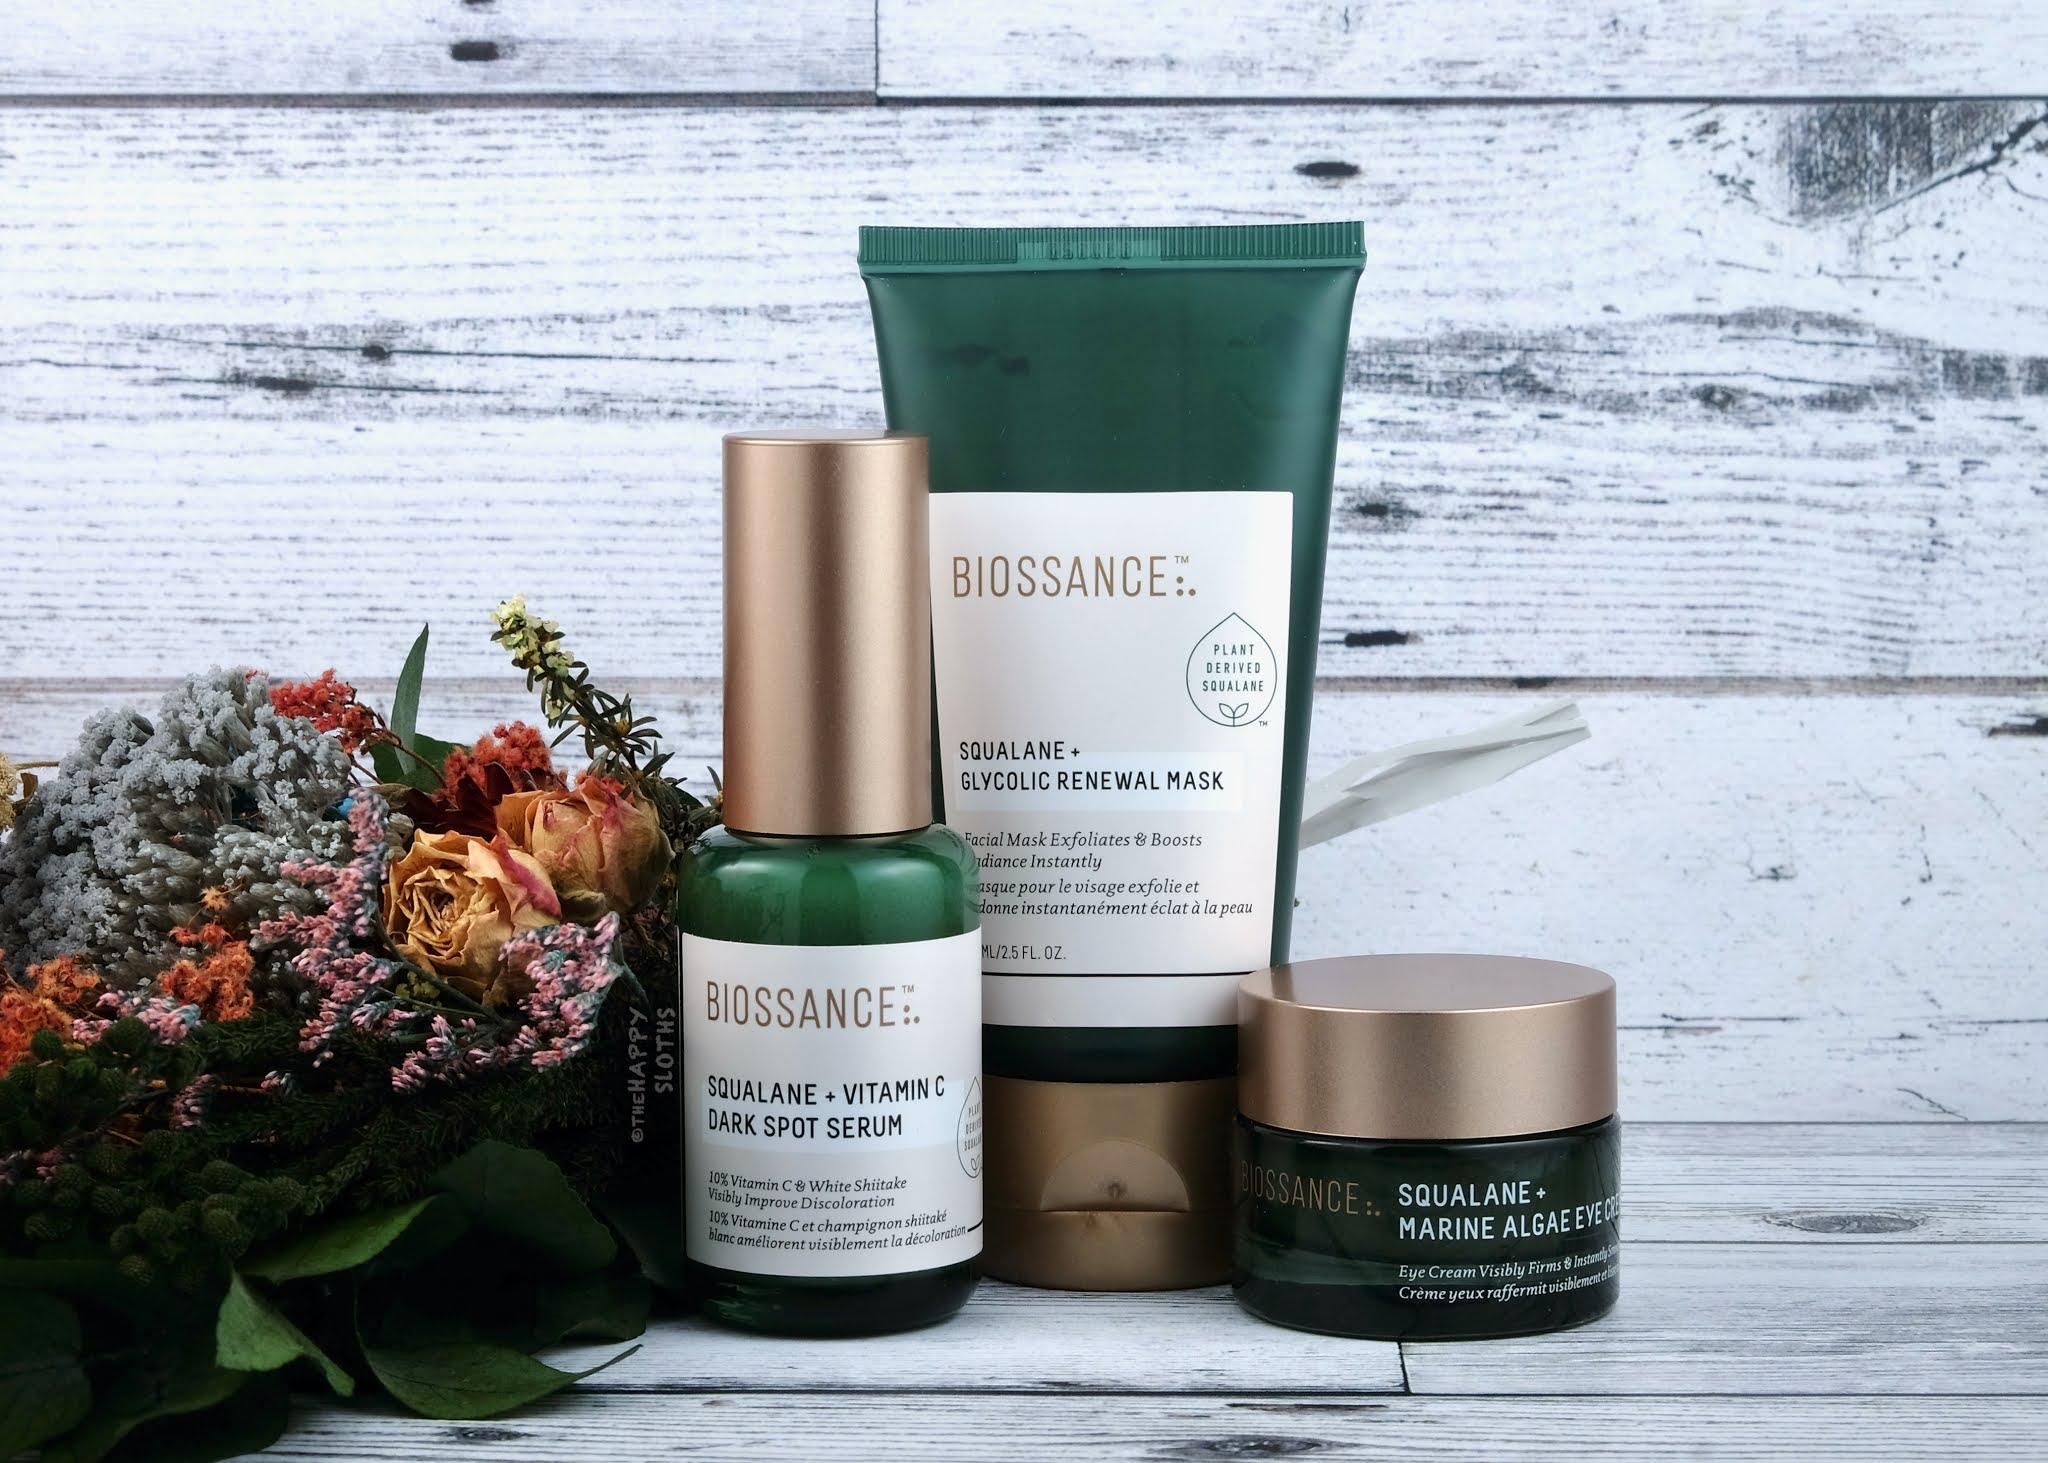 Biossance | Squalane + Glycolic Renewal Mask, Squalane + Vitamin C Dark Spot Serum & Squalane + Marine Algae Eye Cream: Review